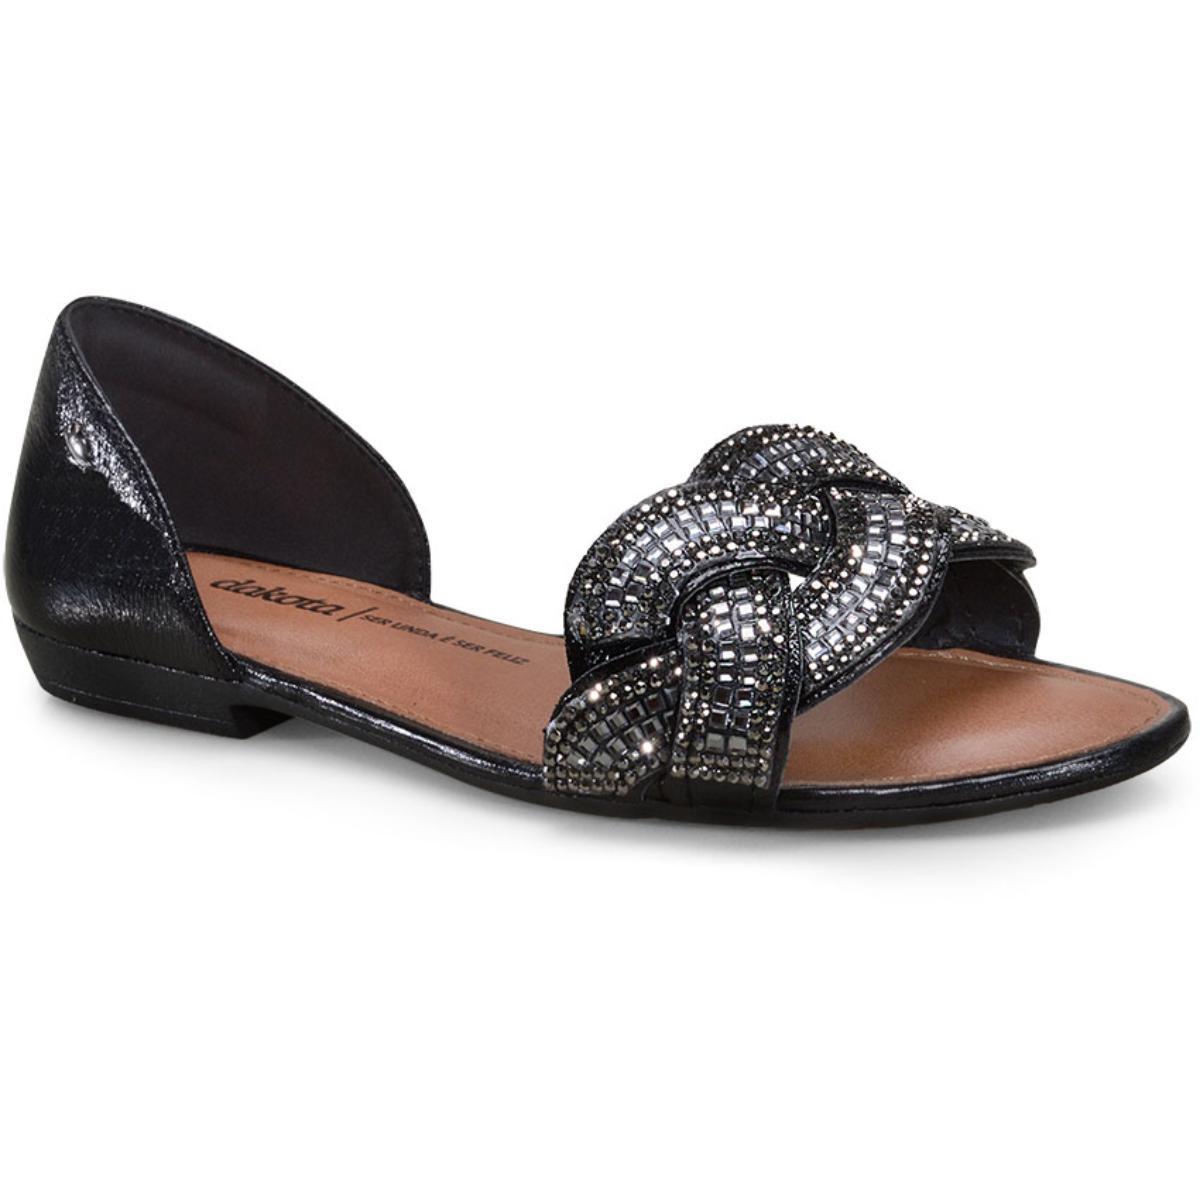 Sandália Feminina Dakota Z6831 Preto